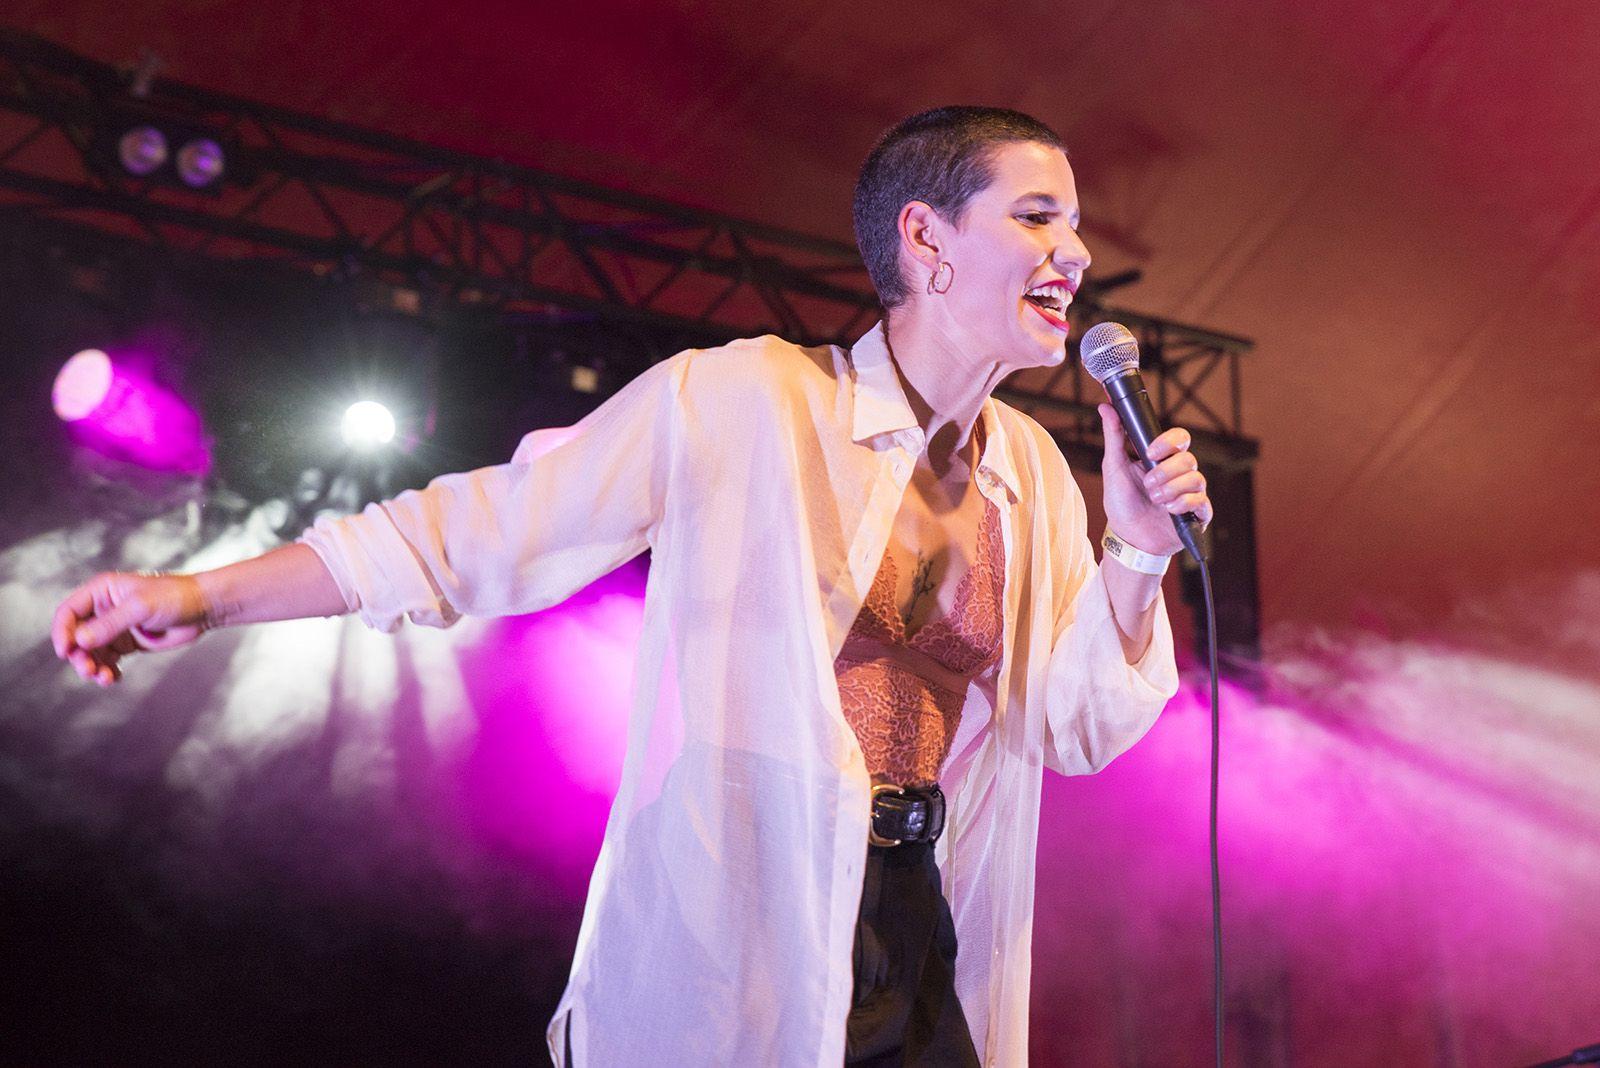 Clara Gispert al festival Petits Camaleons. FOTO: Bernat Millet.